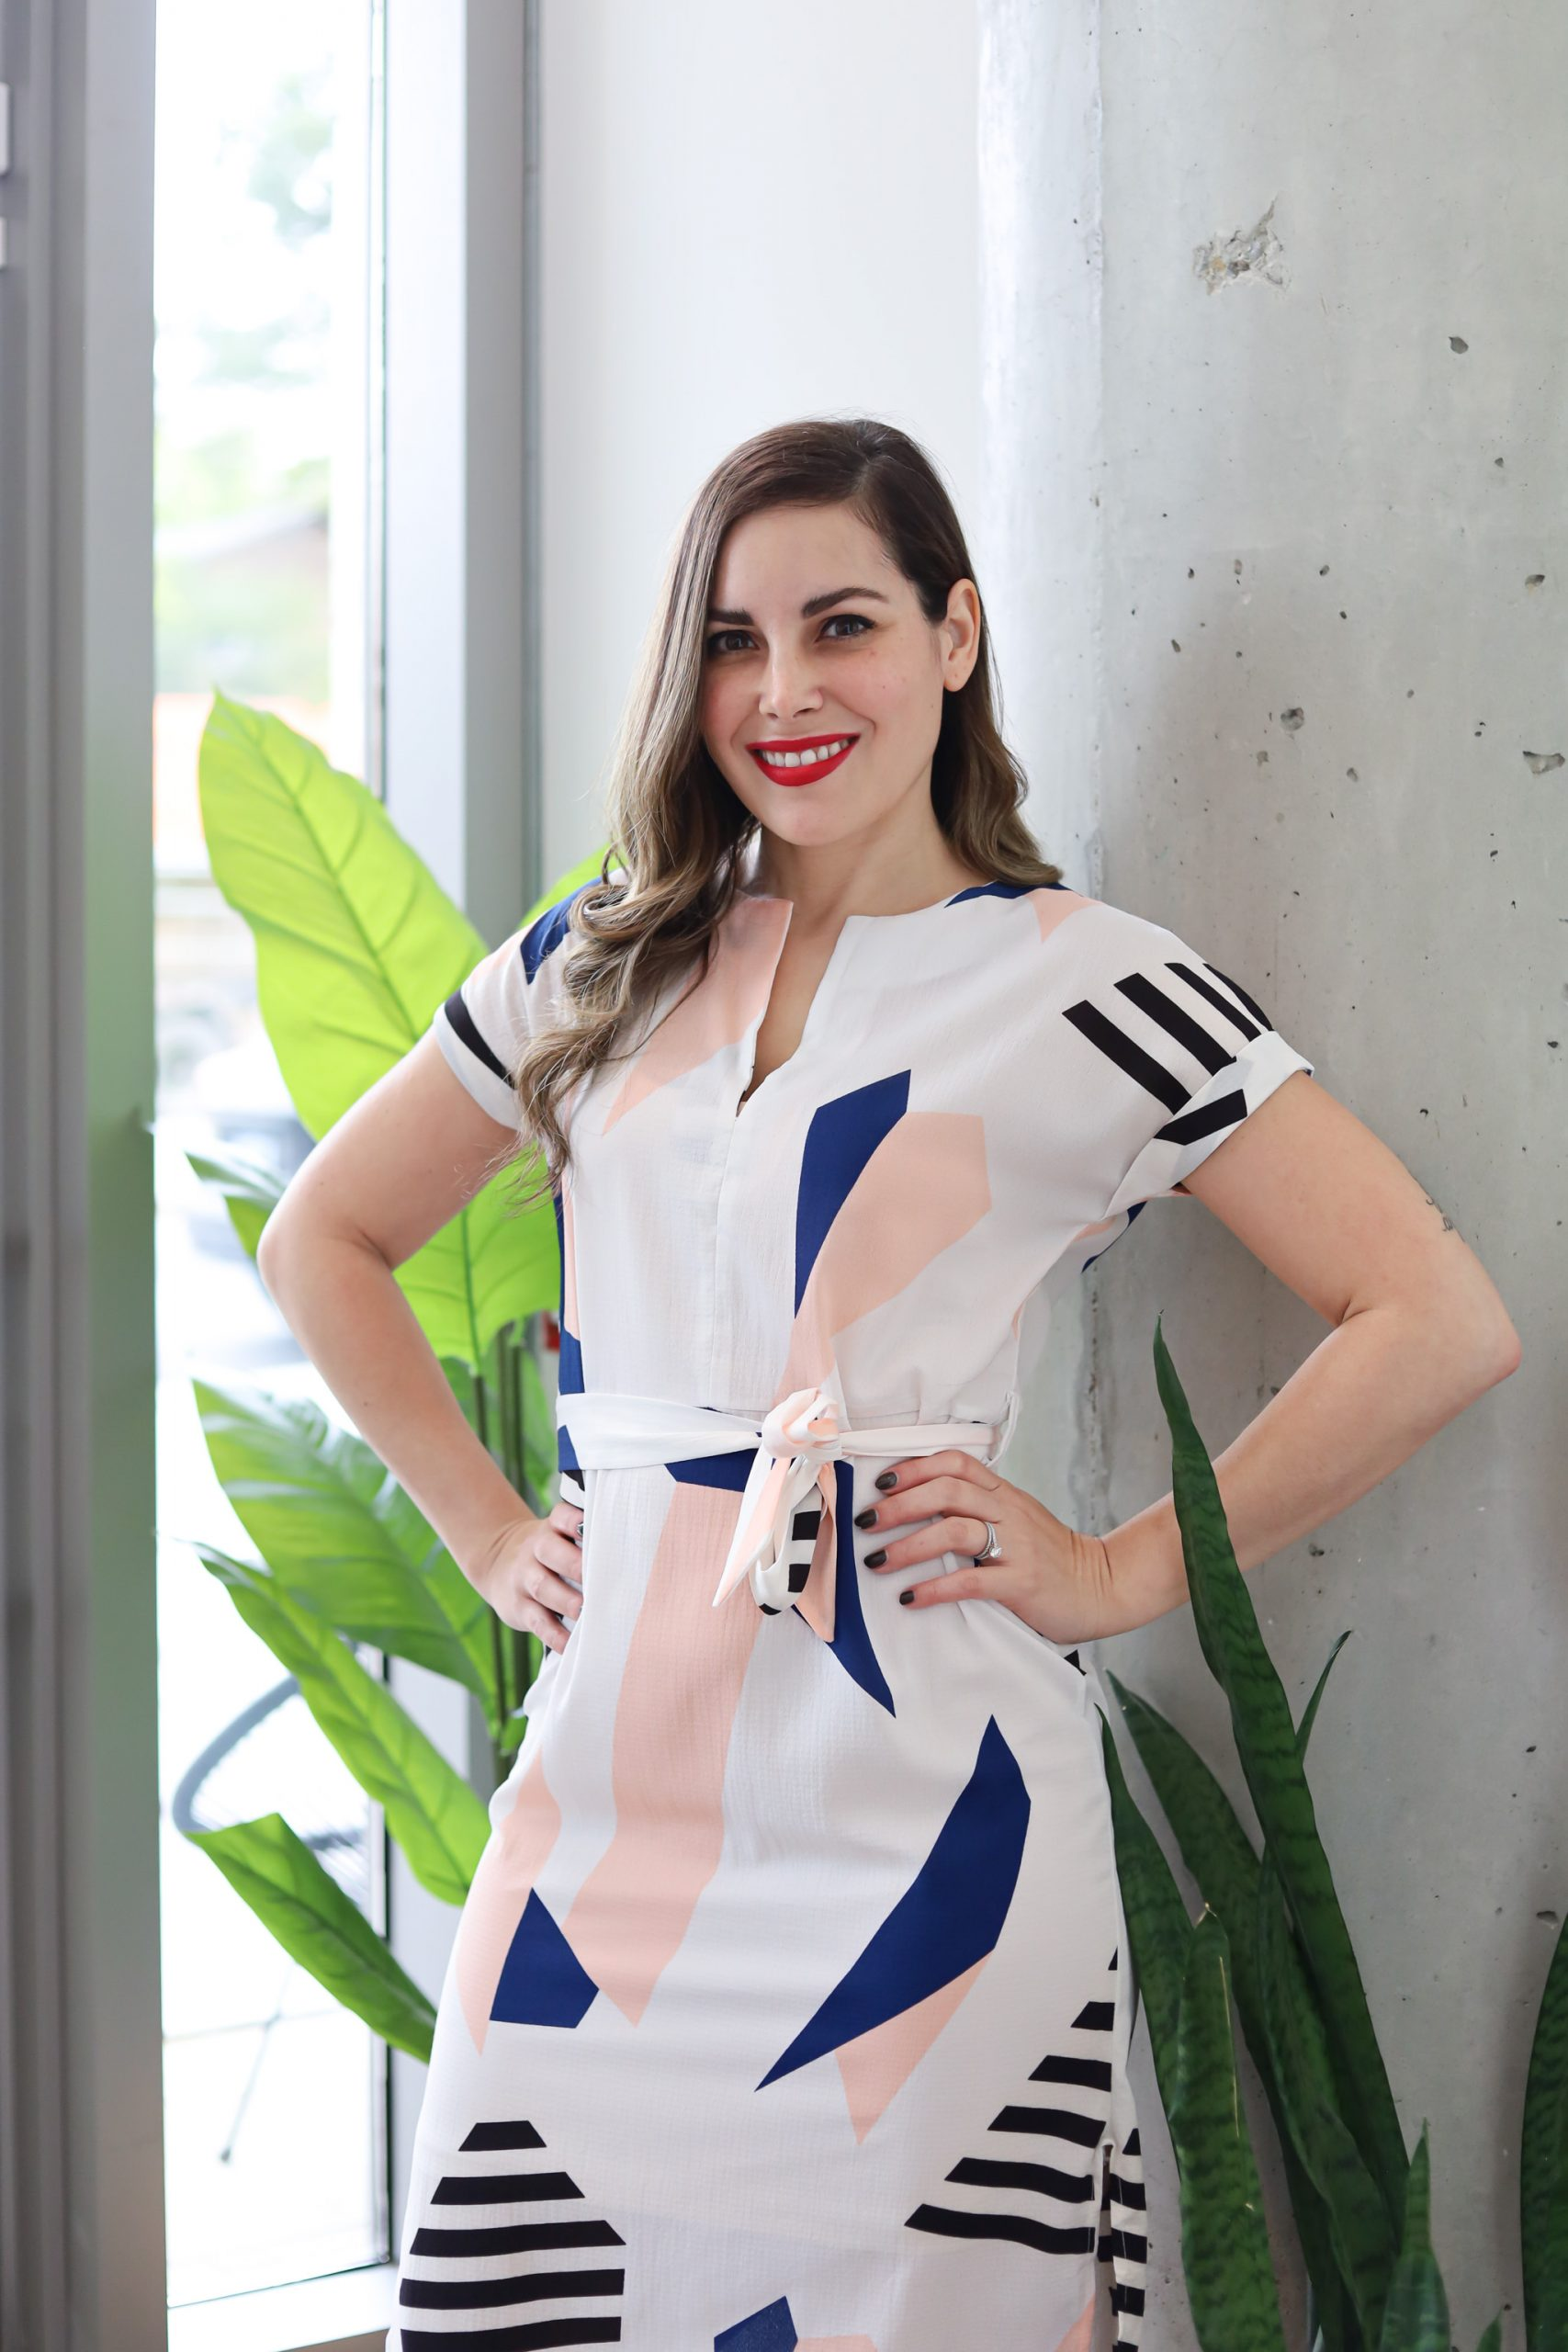 Felicia Sprague